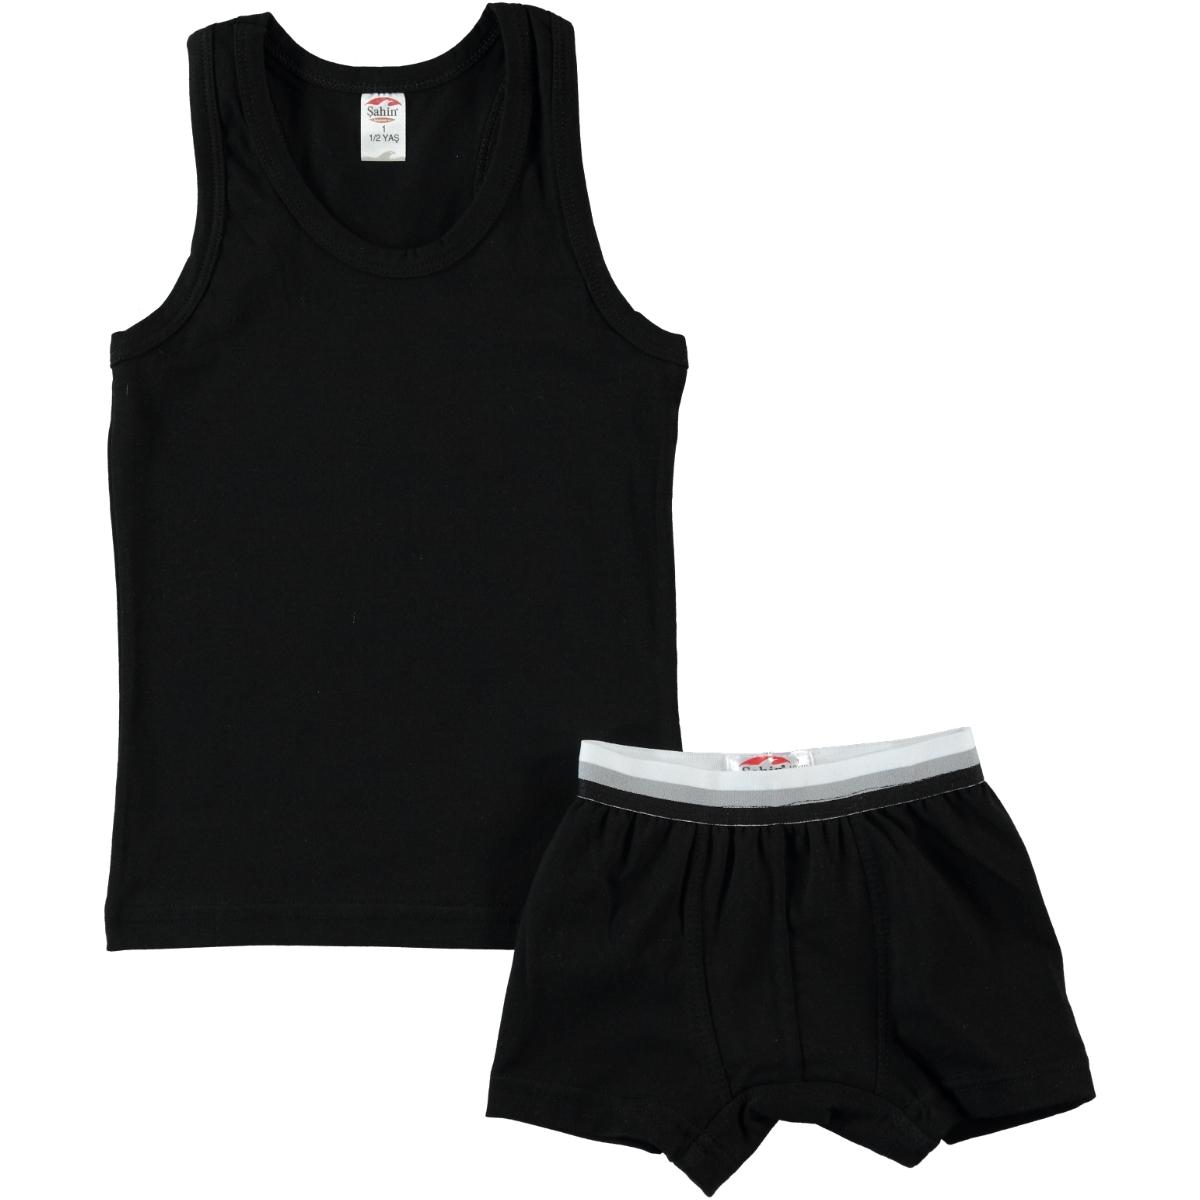 Şahin Boy In Black Underwear Combing The 1-9 Age Team